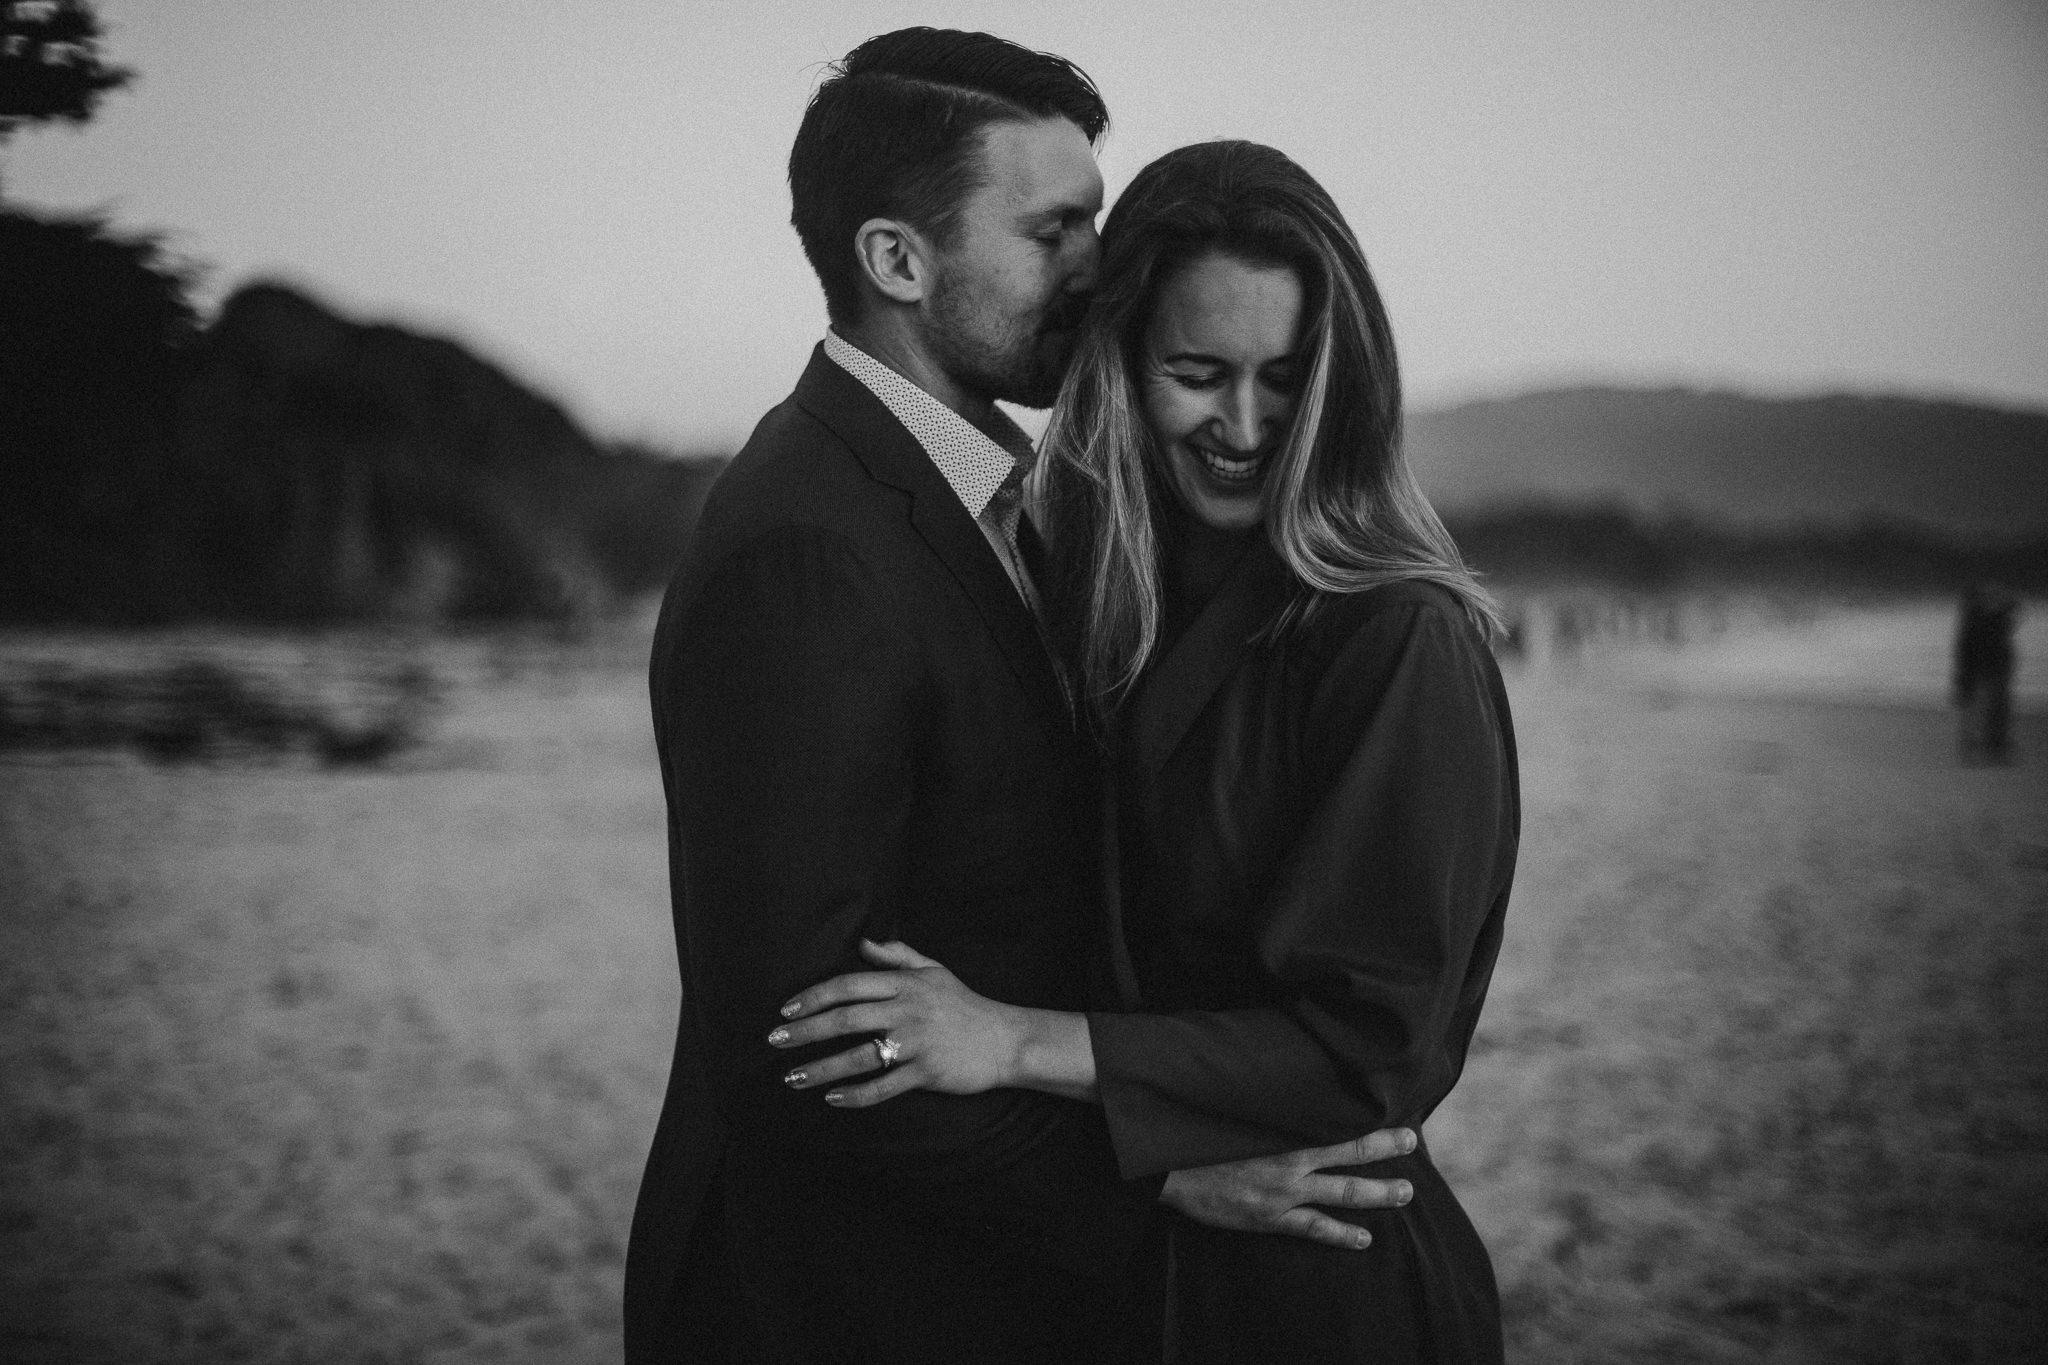 Archer Inspired Photography Carmel Beach California Wedding Engagement Lifestyle Anniversary Natural Light Photographer-90.jpg